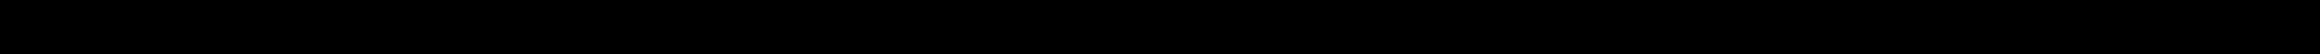 BREMBO 1E0698451, 1E0698451B, 1E0698451C, 1E0698451D, 1E0698451E Sada brzdových destiček, kotoučová brzda